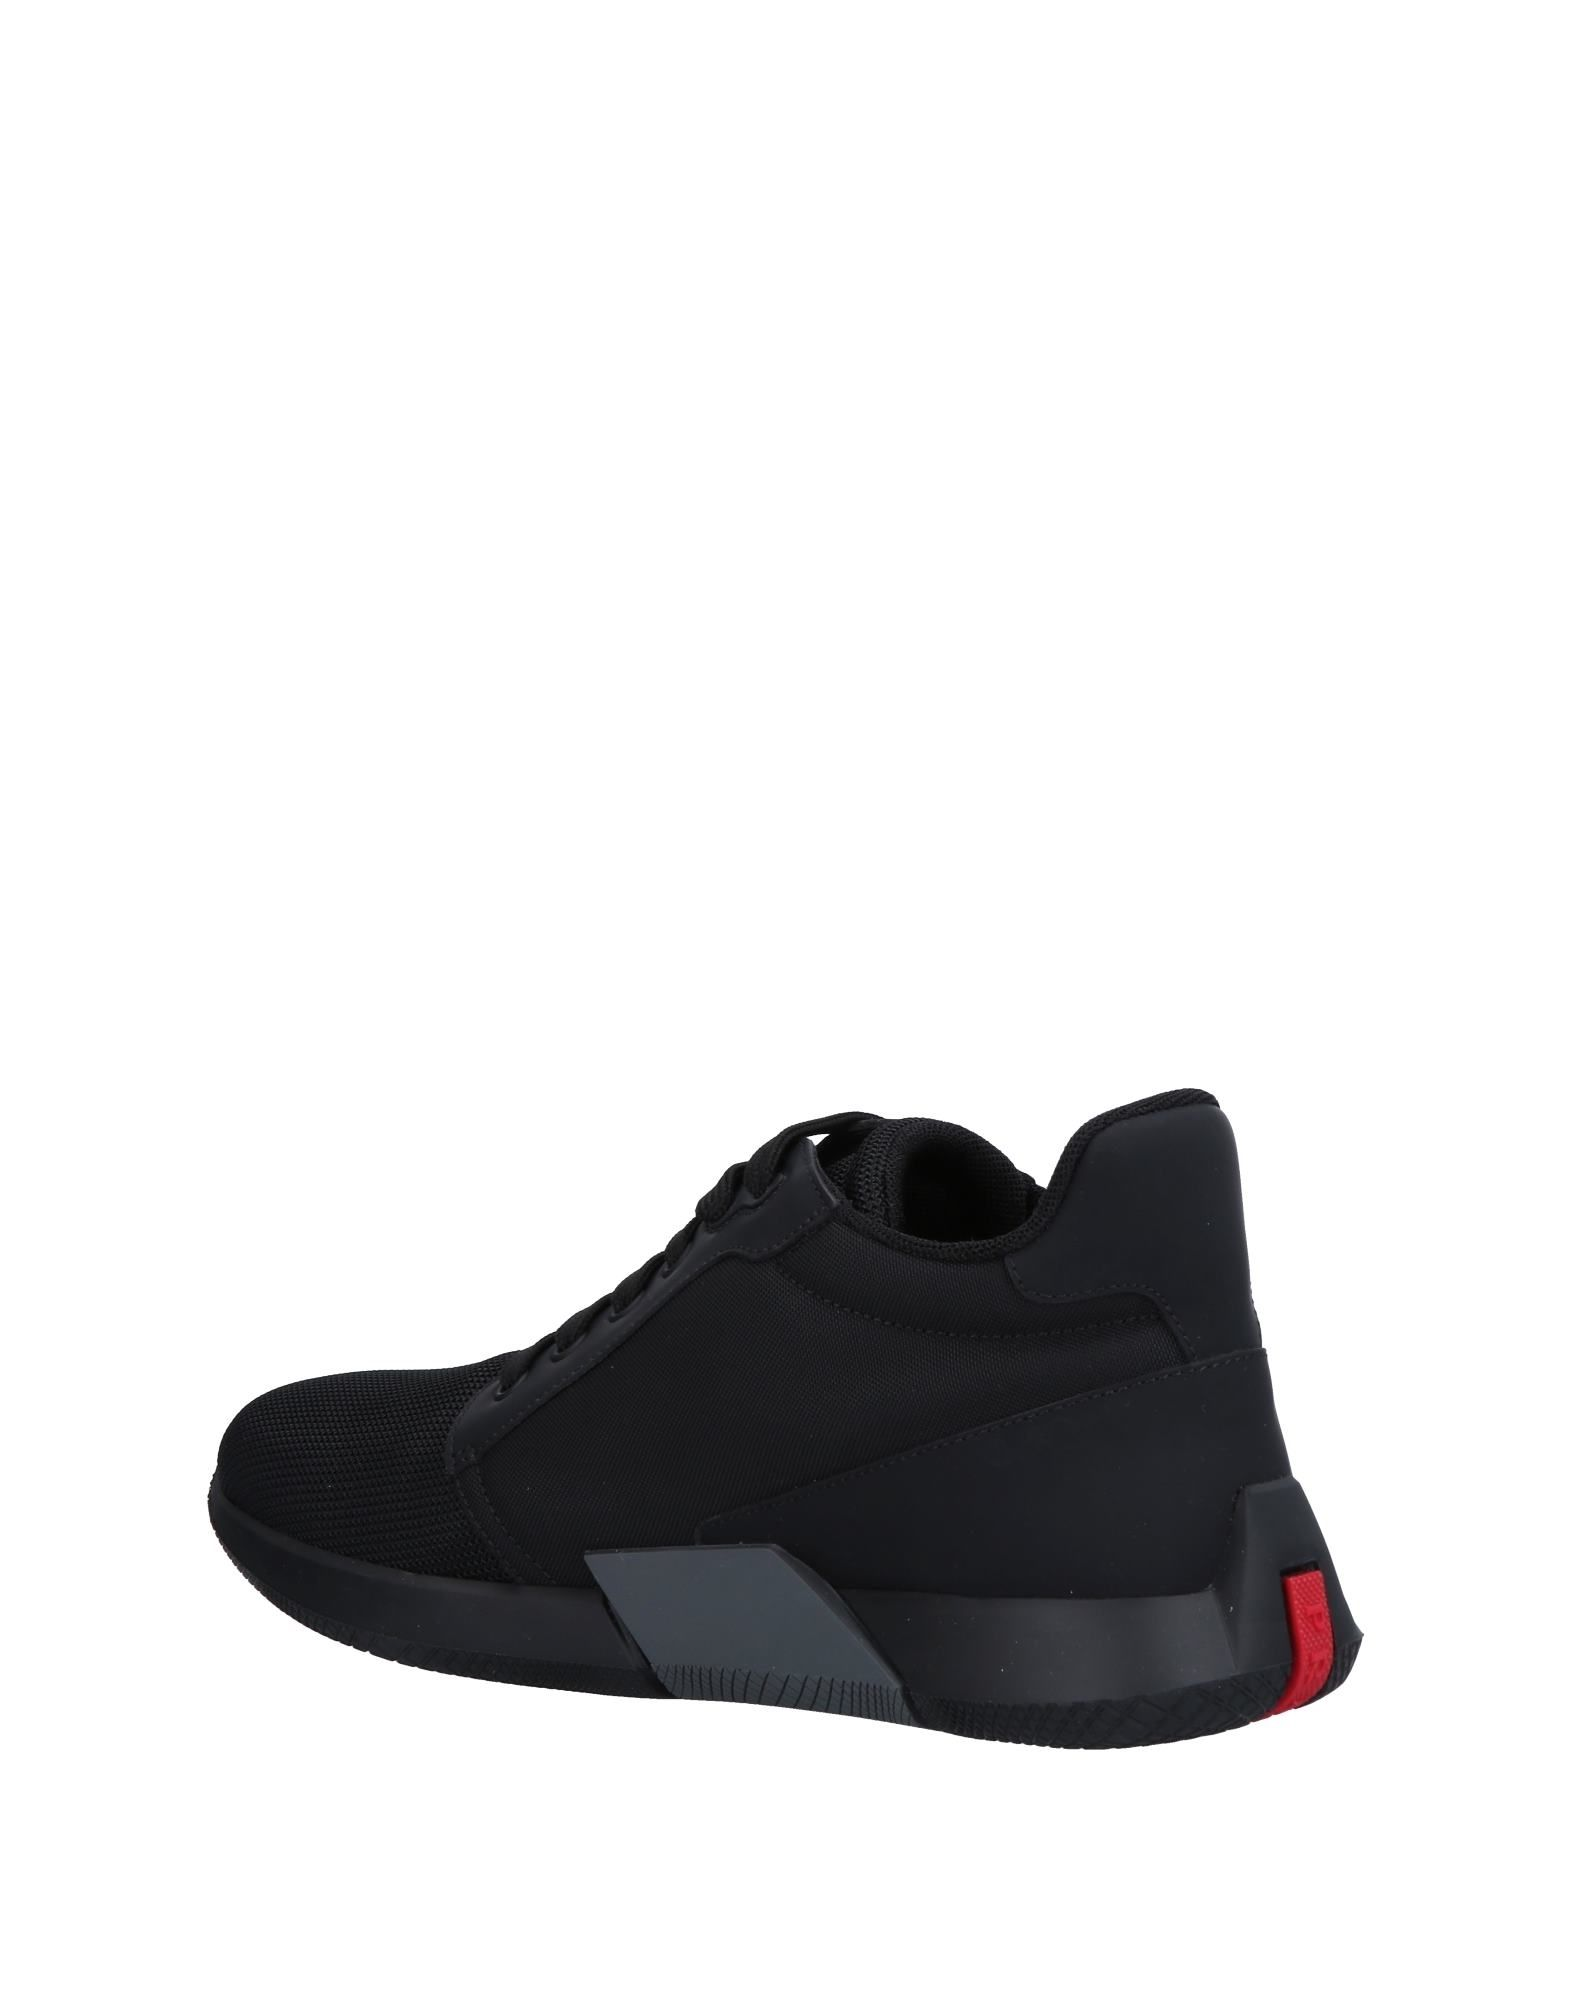 Prada Sport Sneakers Herren  11492667GI Gute Qualität beliebte Schuhe